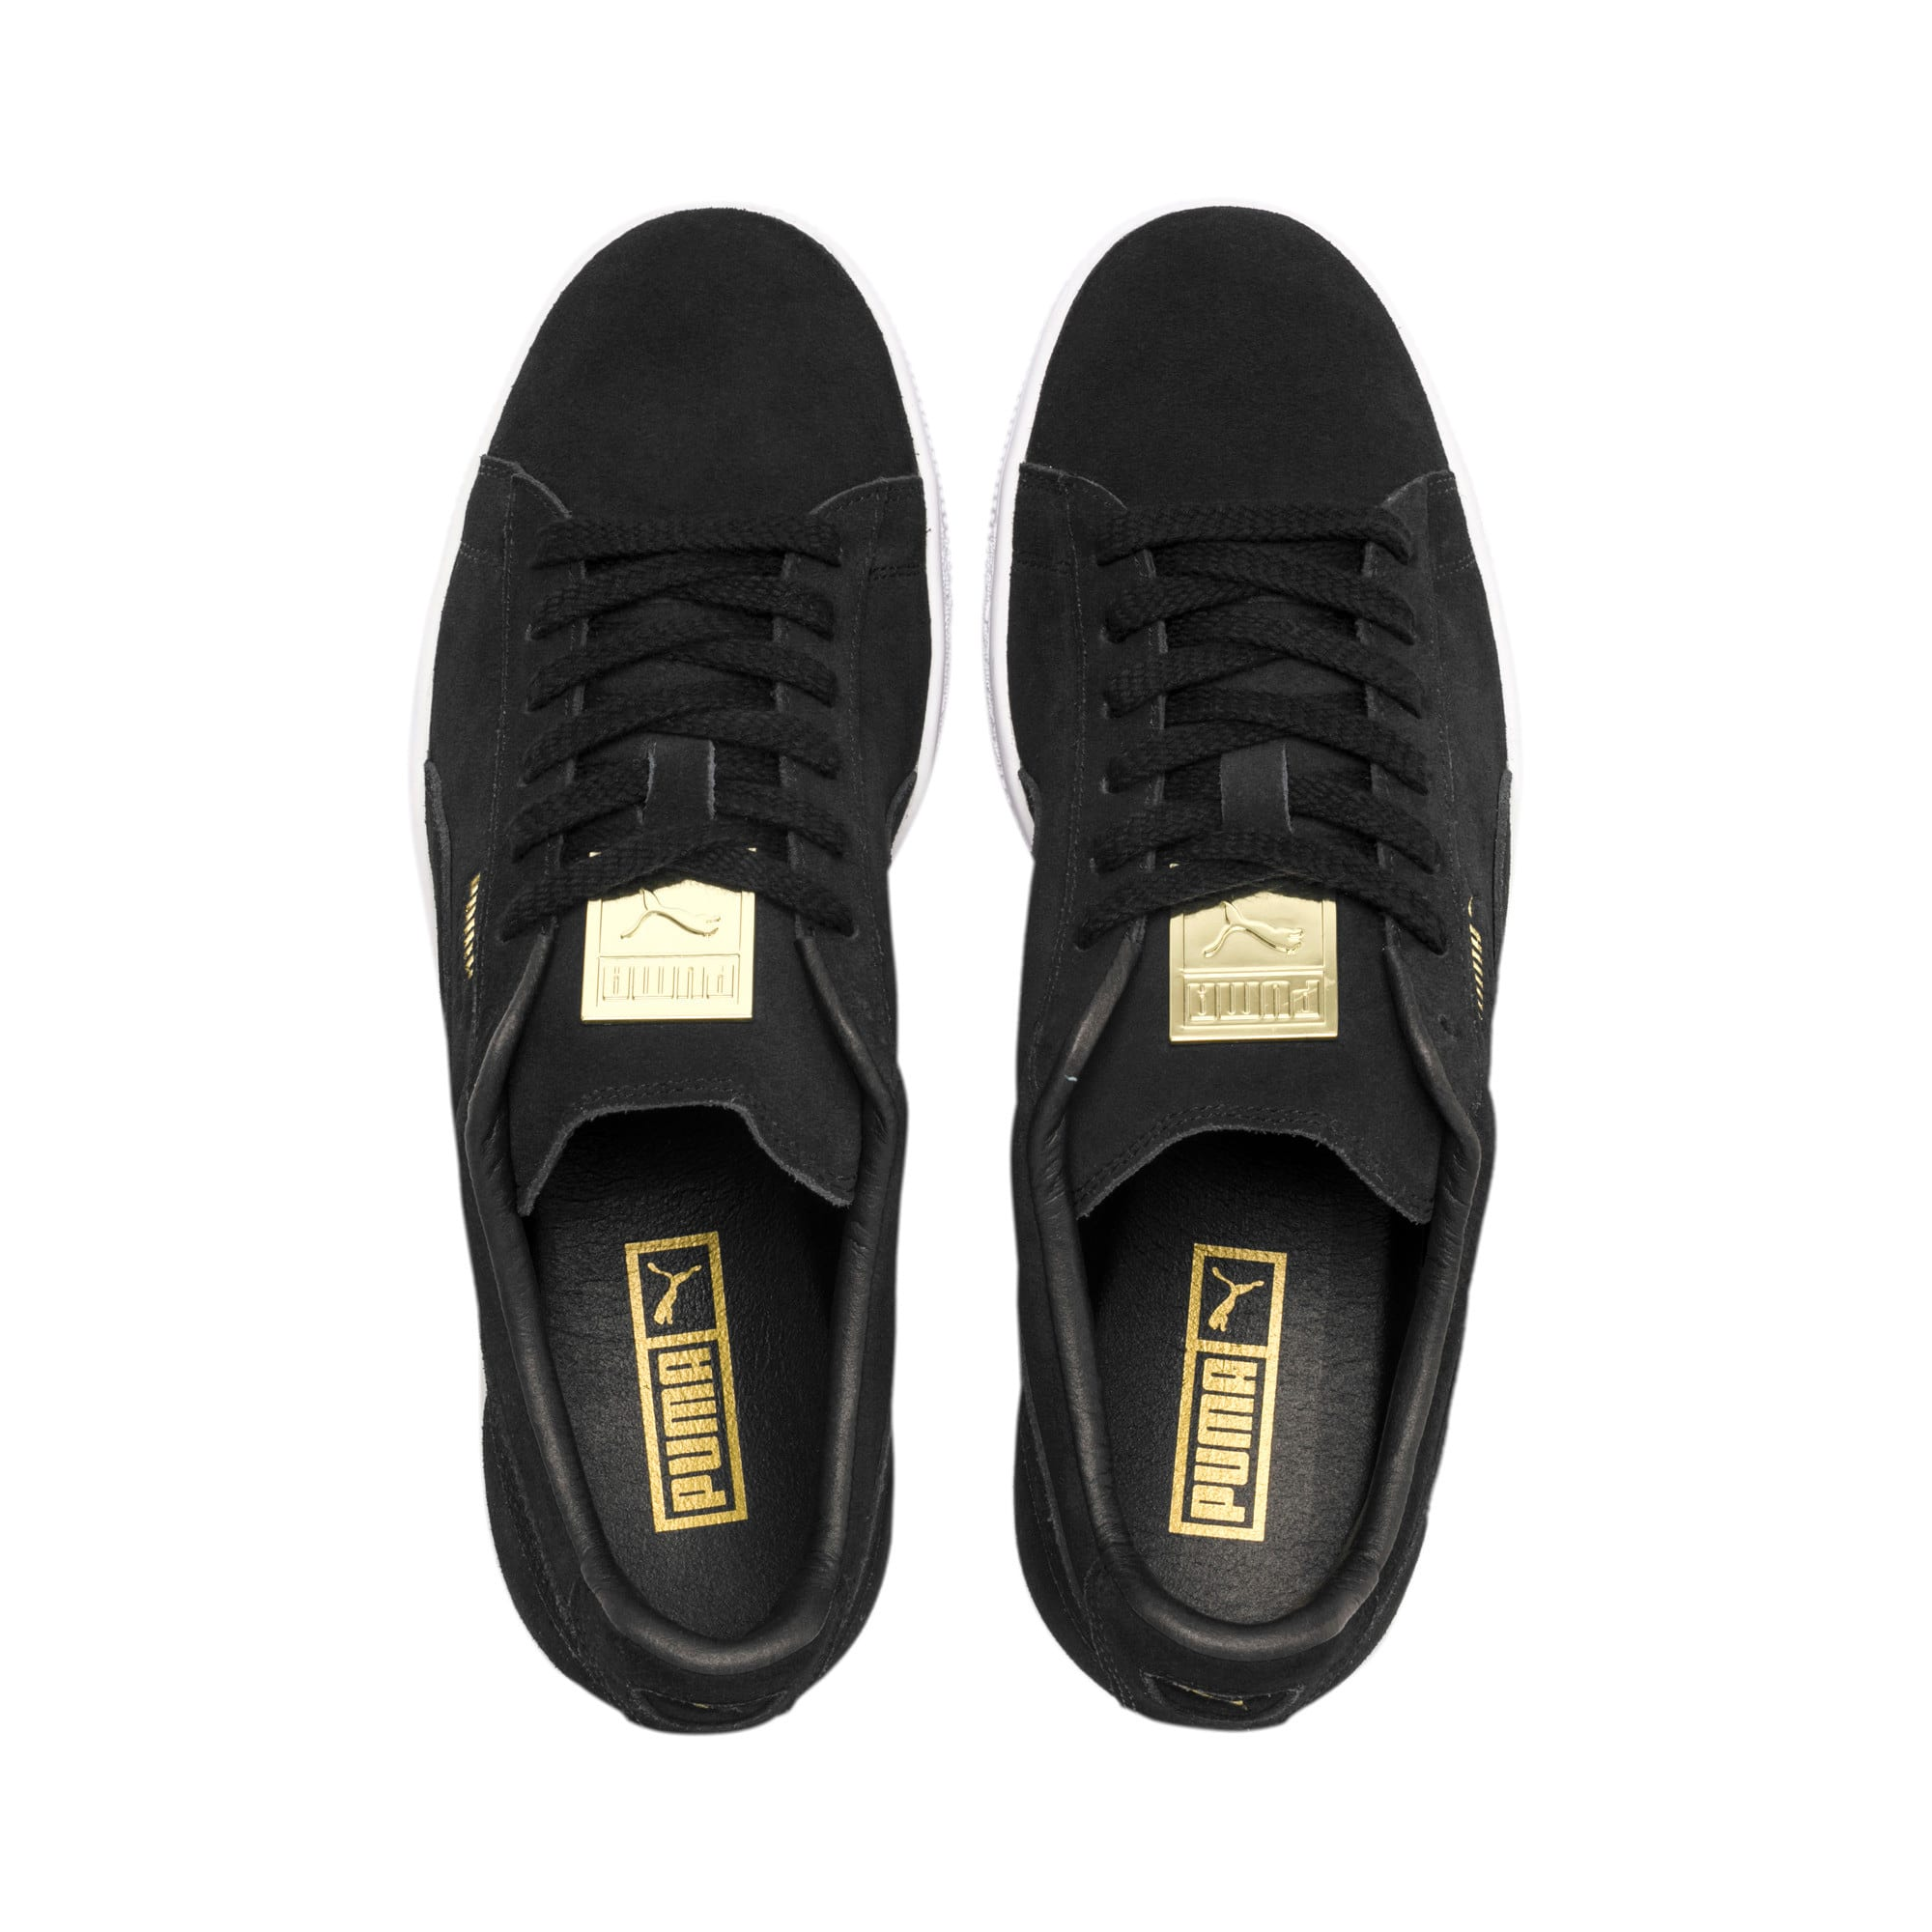 Thumbnail 7 of Suede Classic Metal Badge Sneakers, Puma Black-Puma White, medium